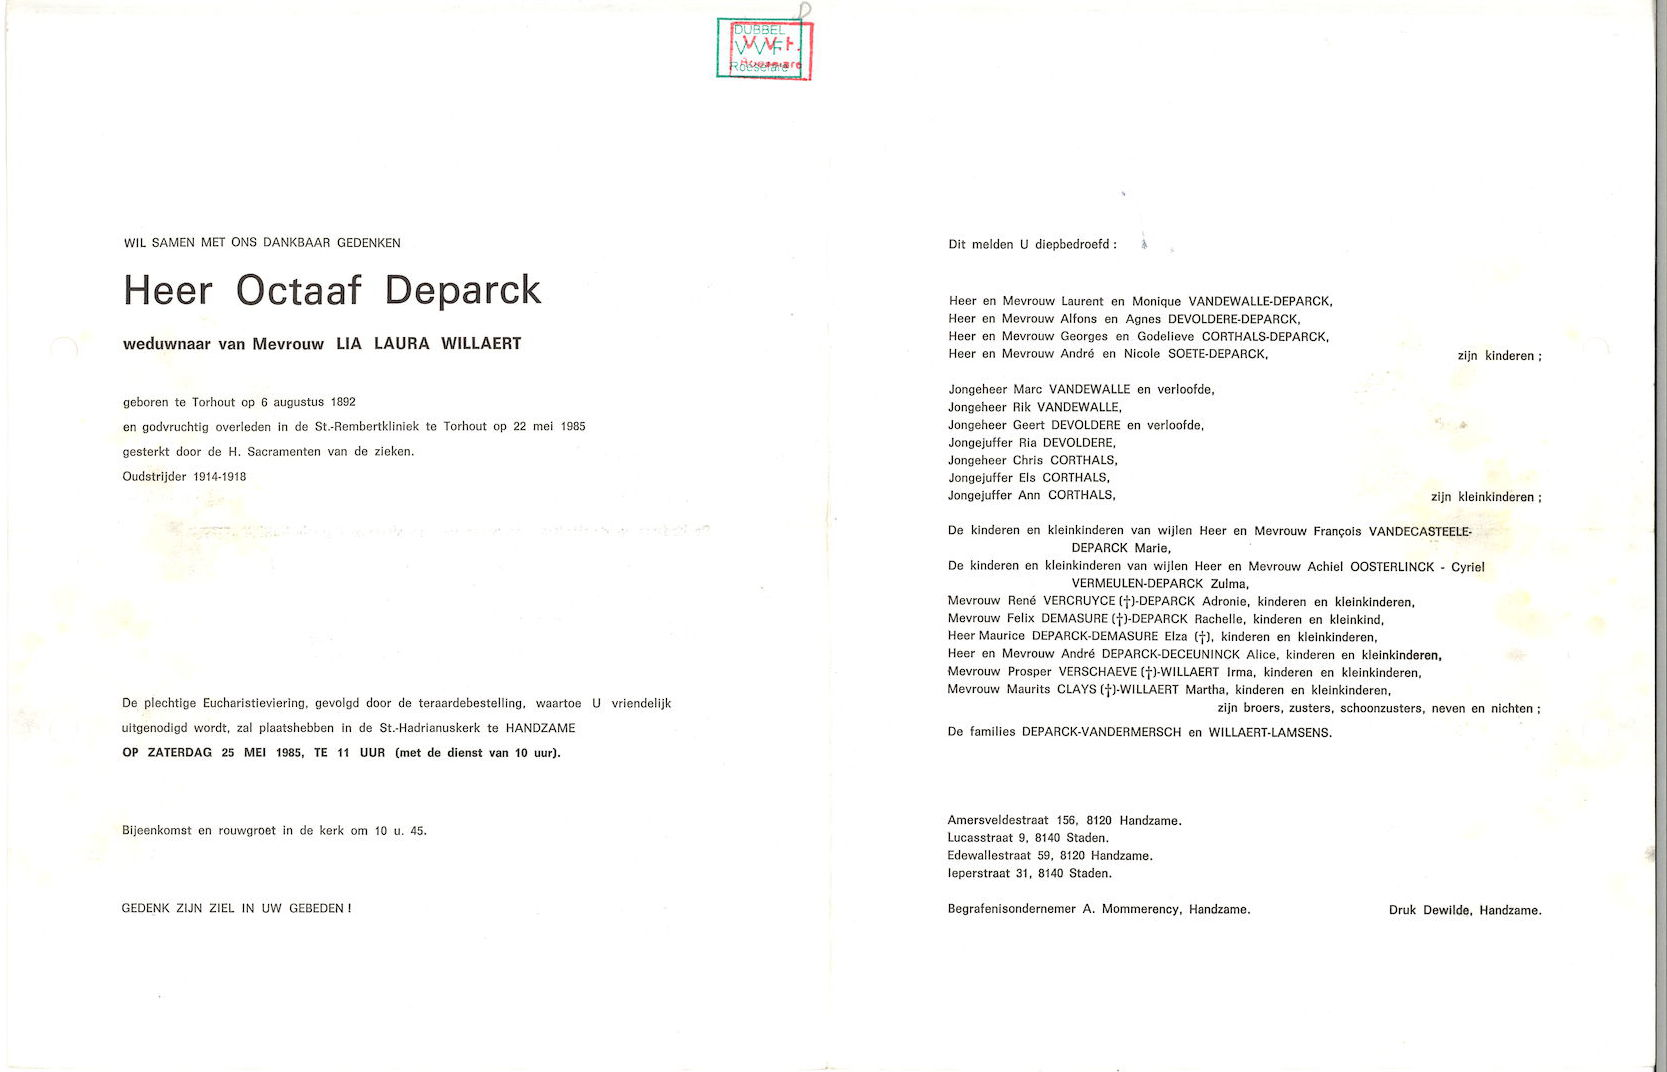 Octaaf Deparck